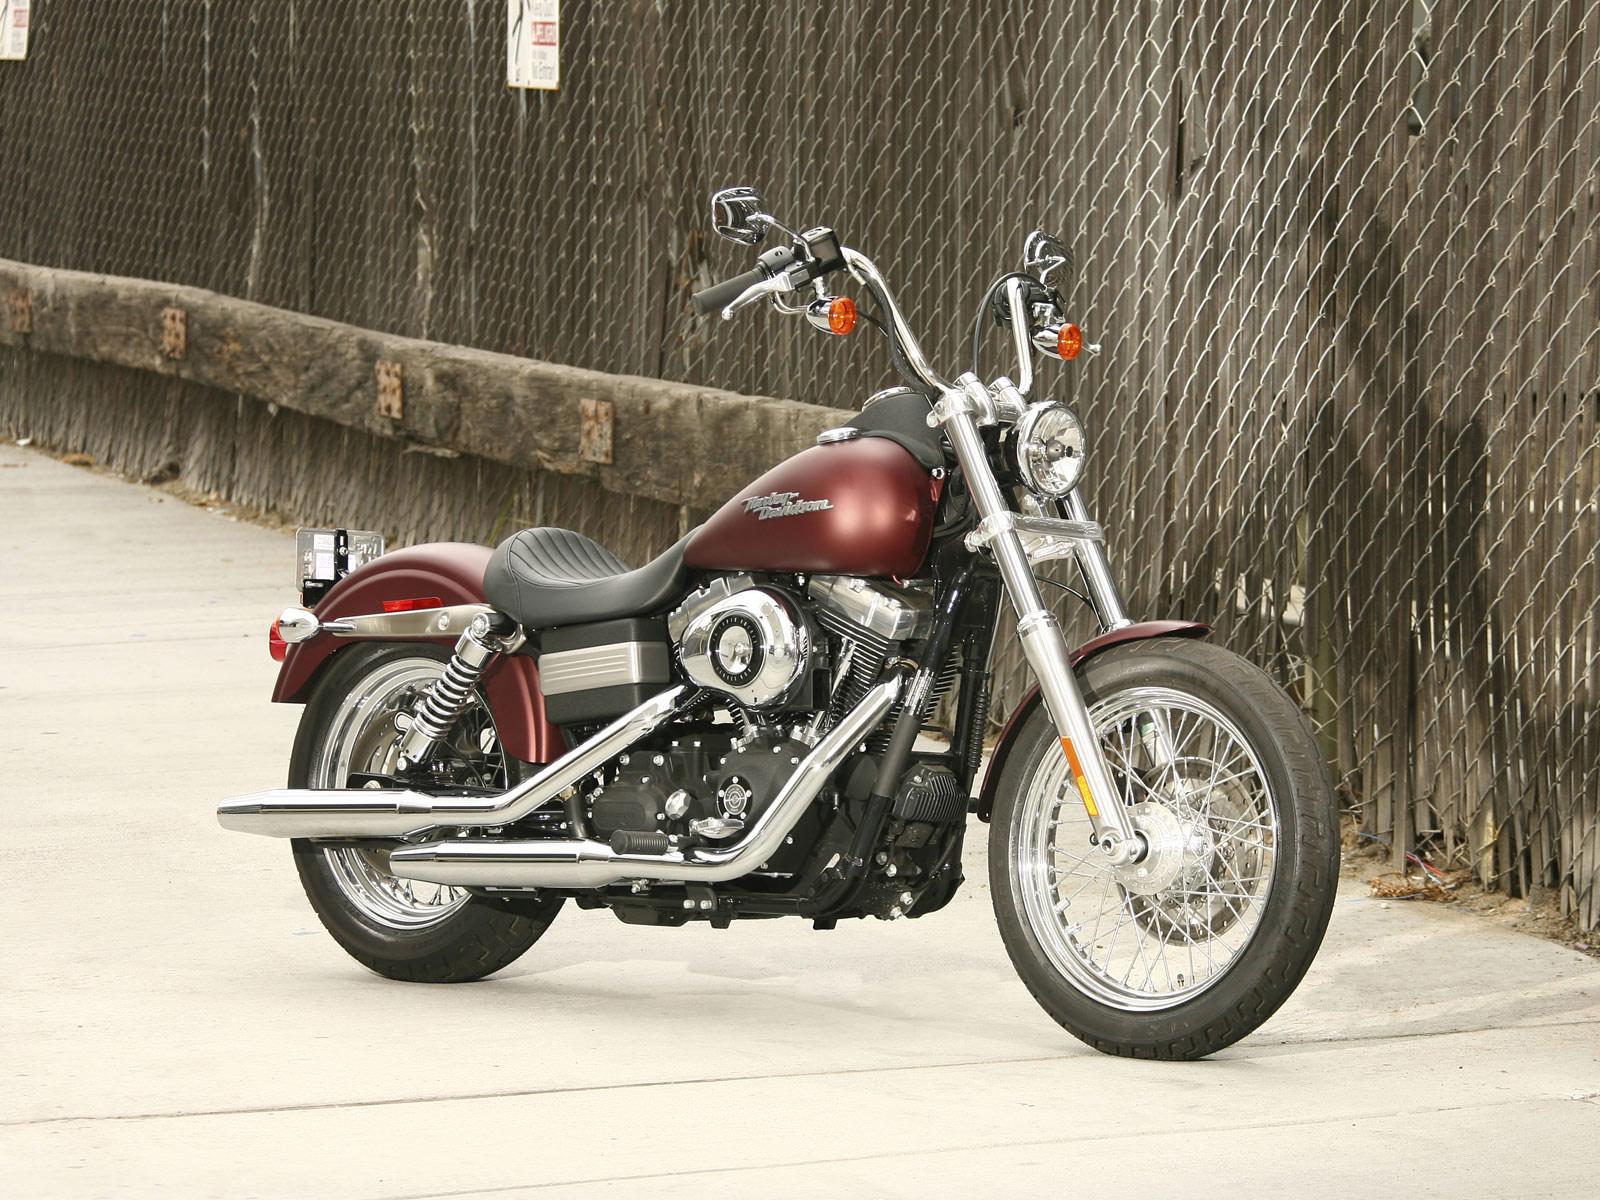 2008 Harley Street Bob